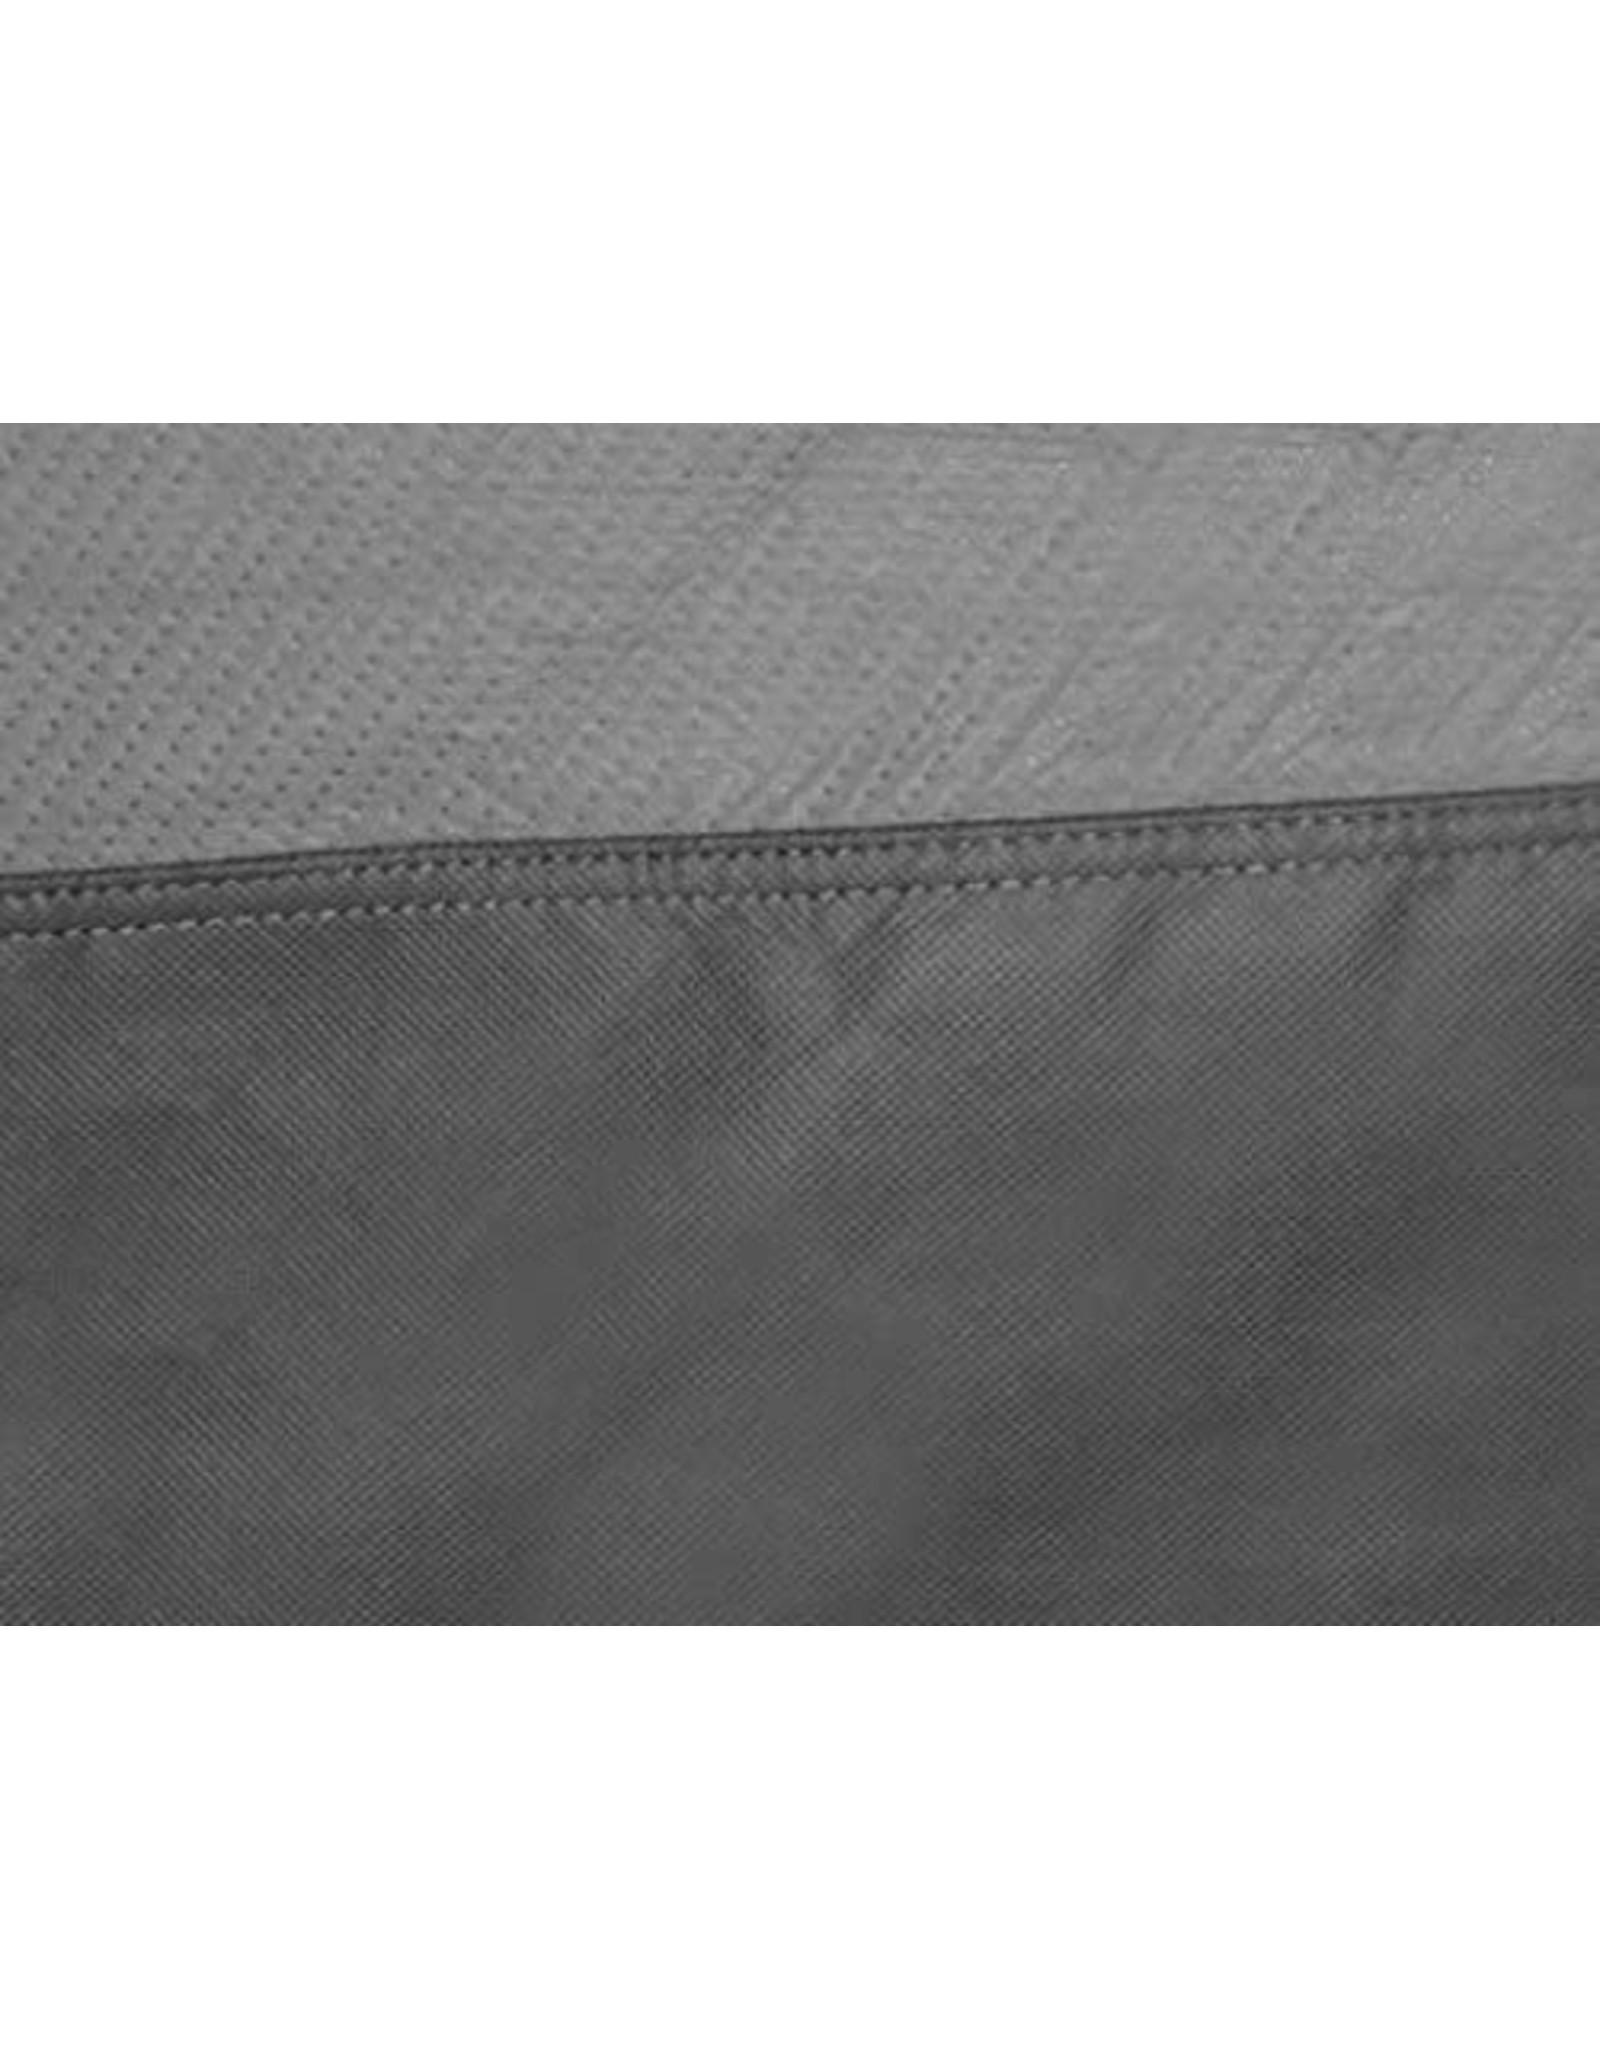 "ADCO ADCO Designer Series DuPont Tyvek Fifth Wheel Trailer Cover Gray/White - 40'1"" - 43'6"" (34858)"